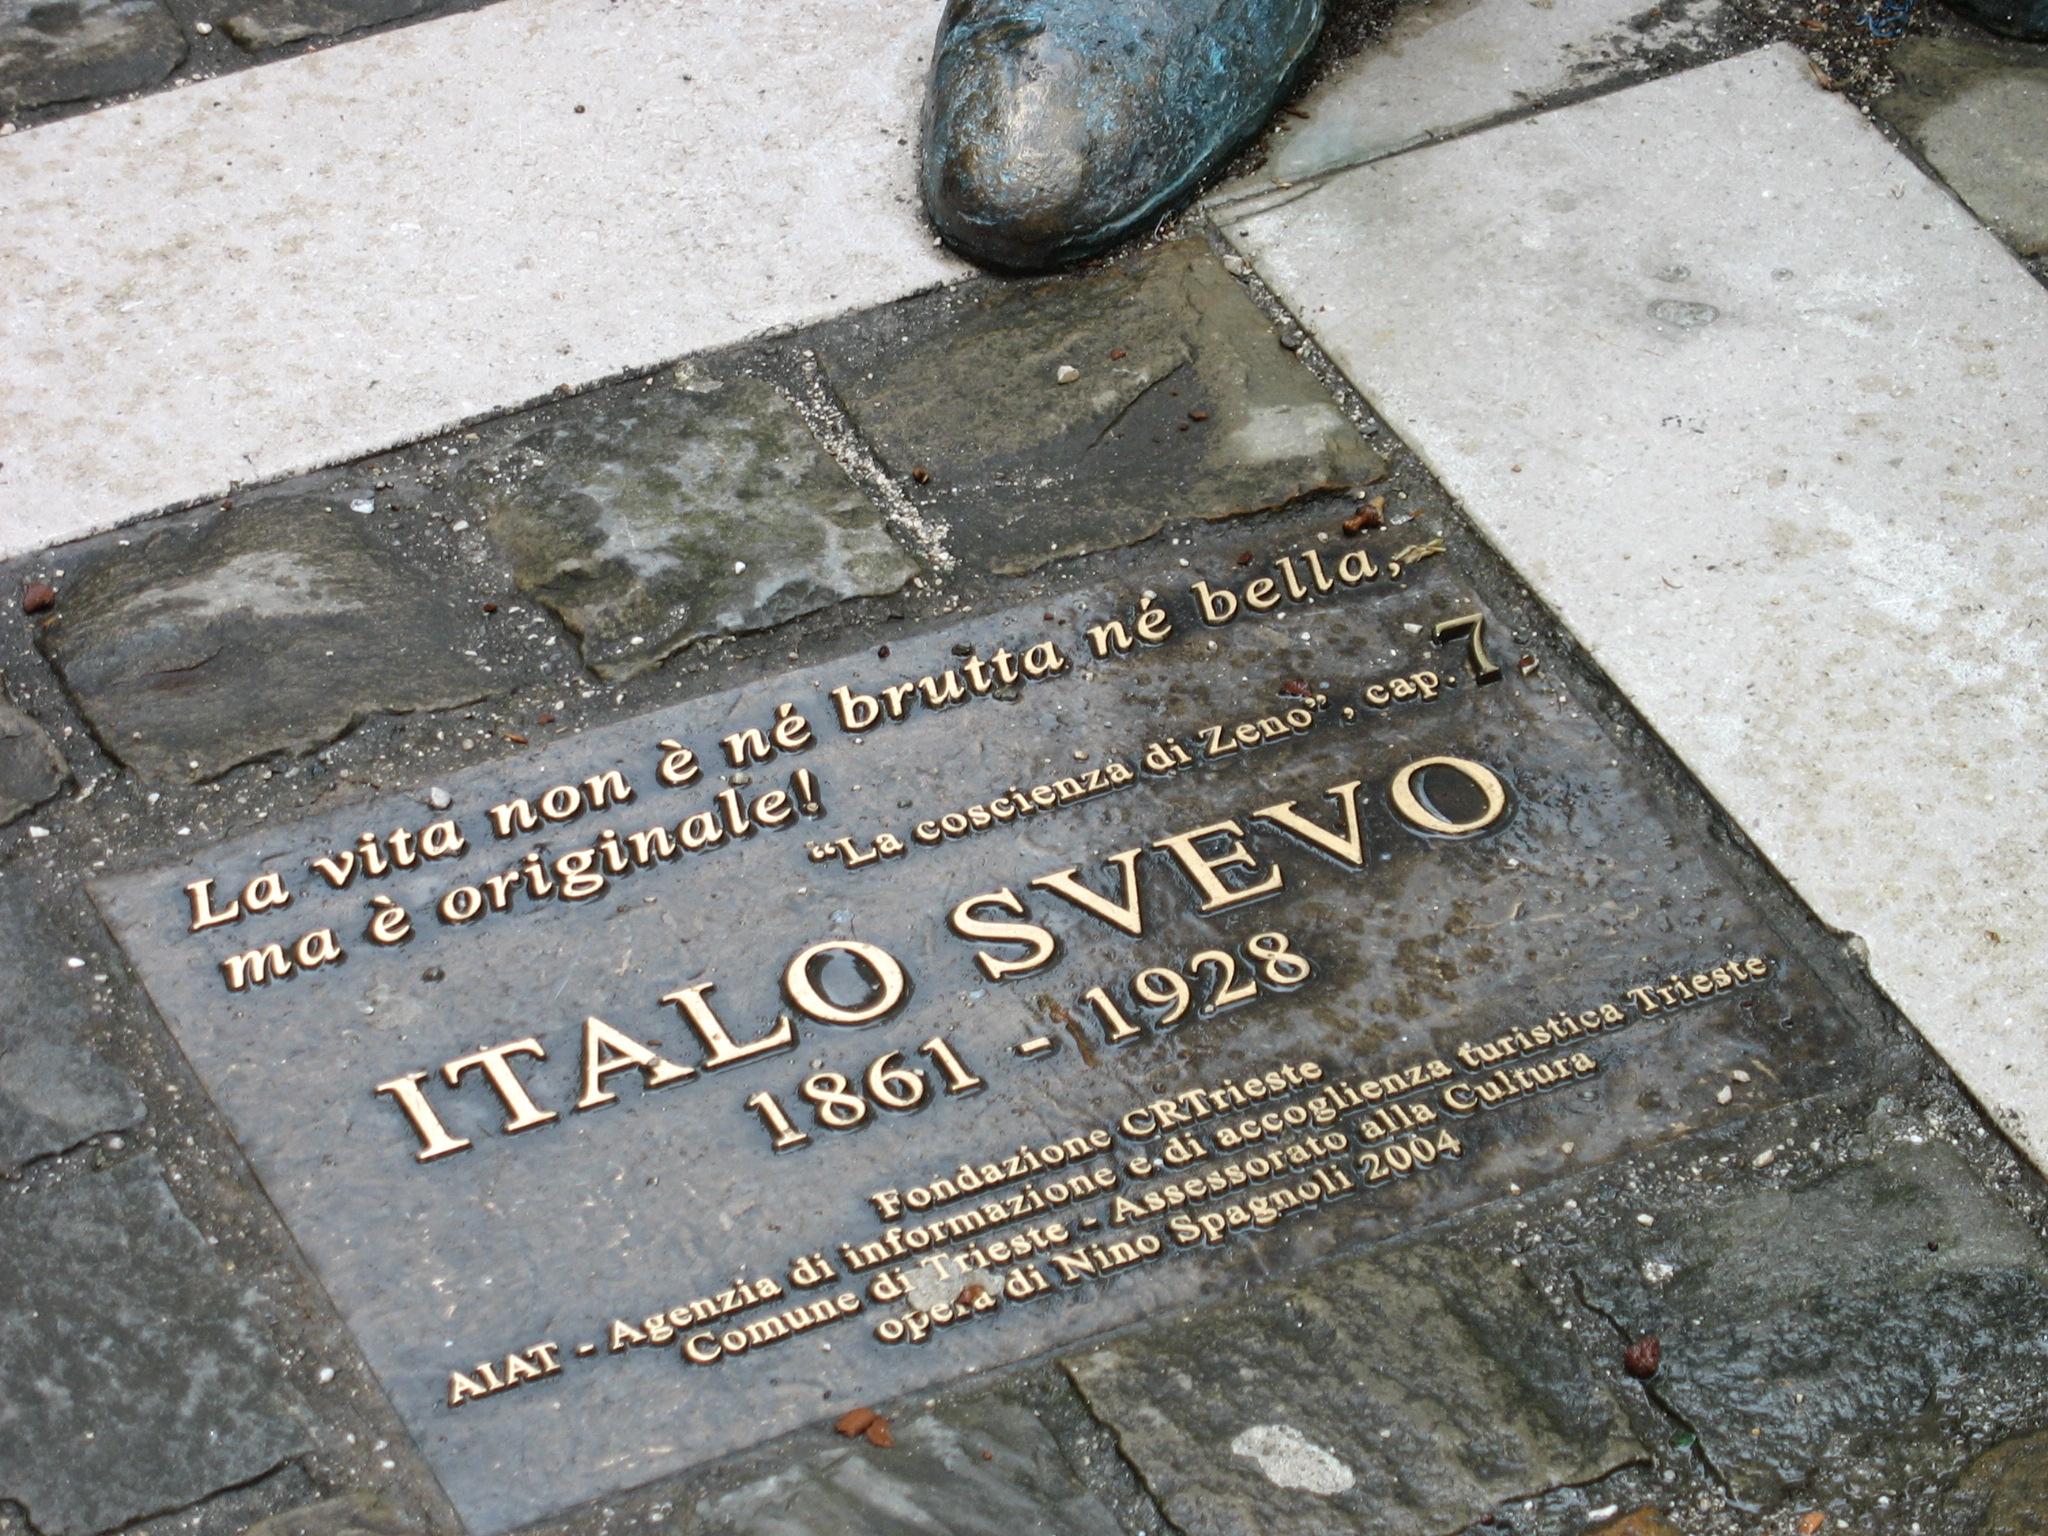 File:ItaloSvevo statue 10.jpg - Wikimedia Commons